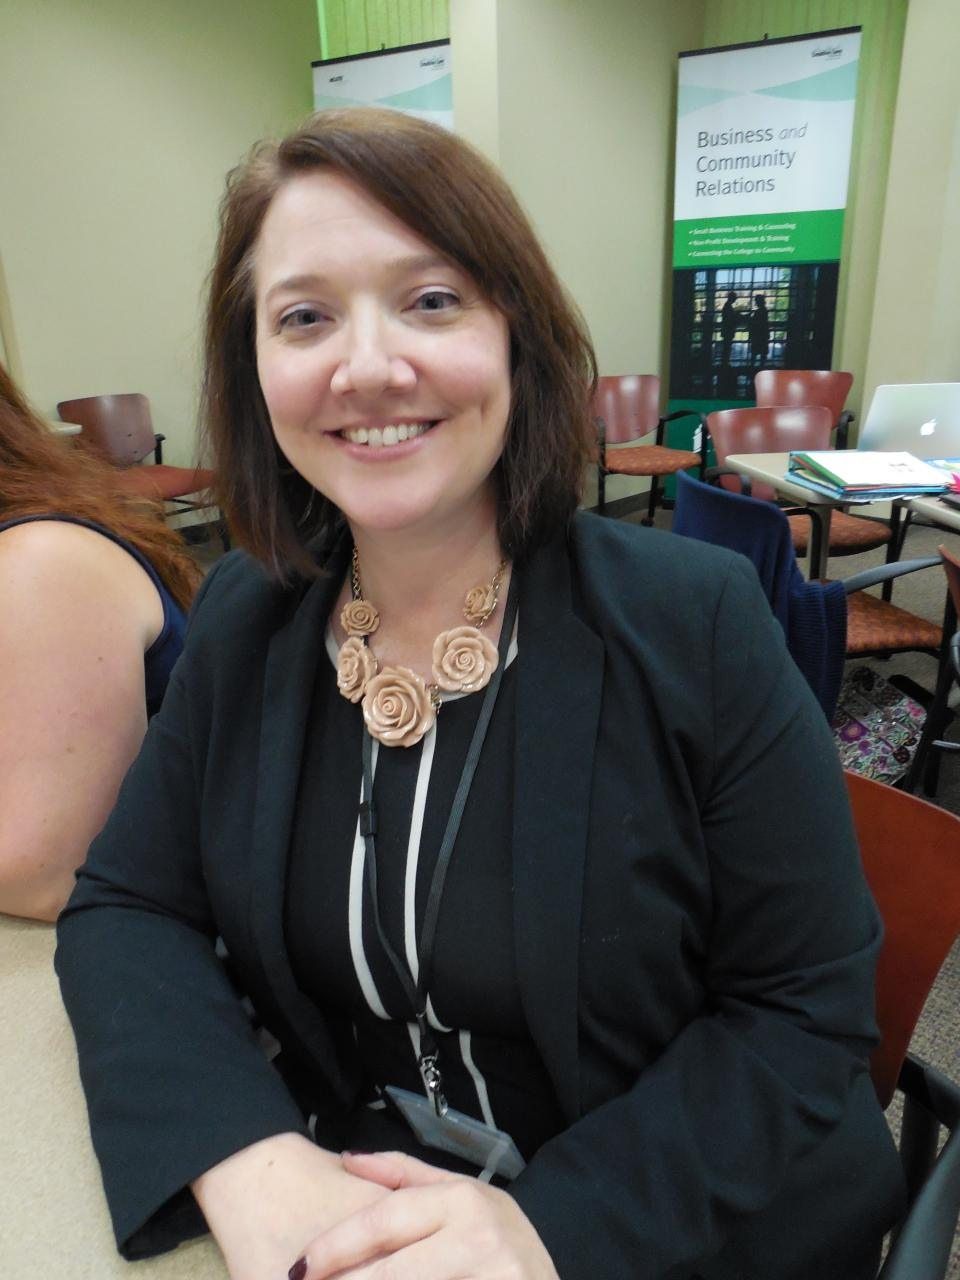 Deborah Ratcliff